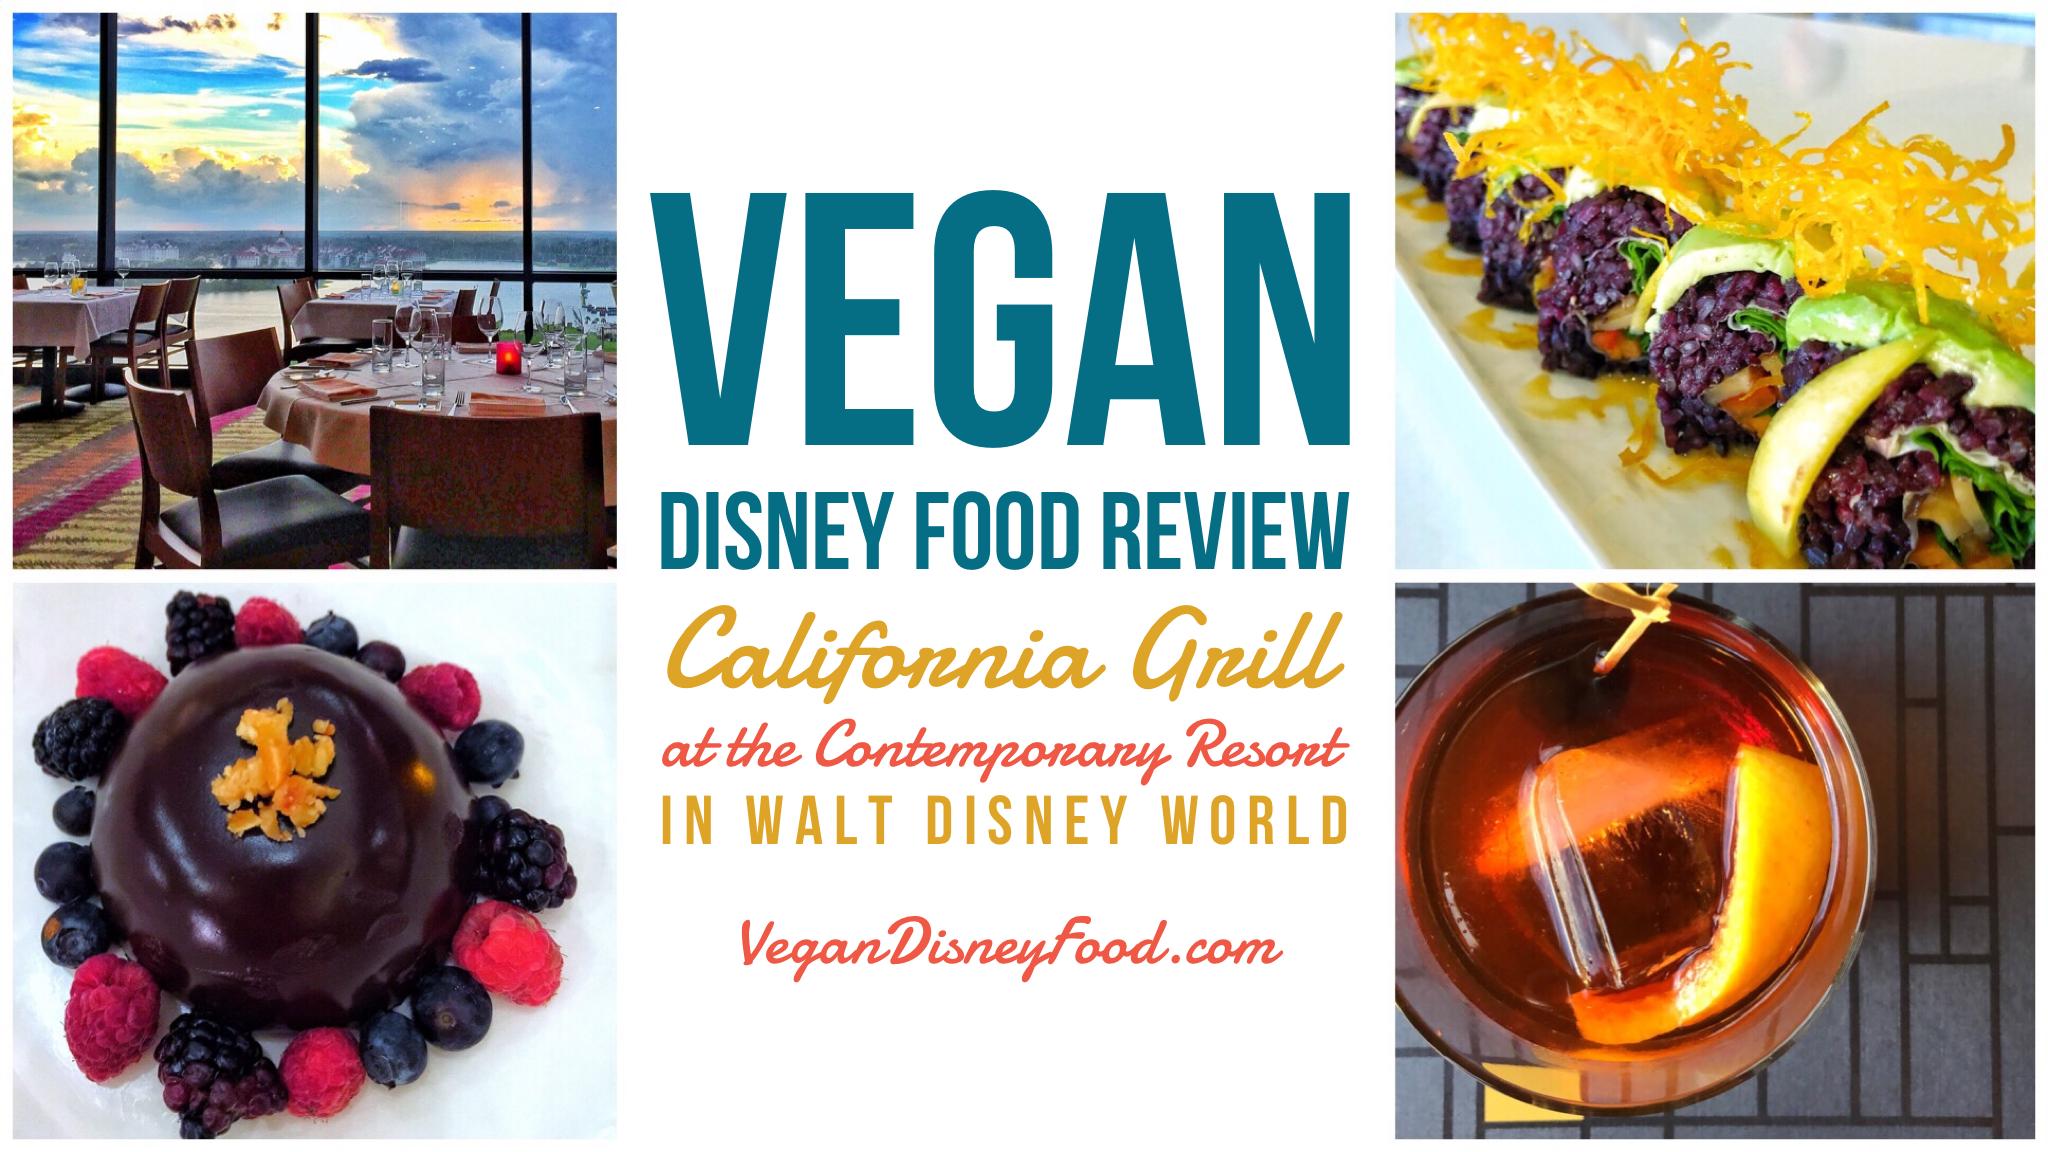 Vegan Disney Food Review: California Grill at the Contemporary Resort in Walt Disney World